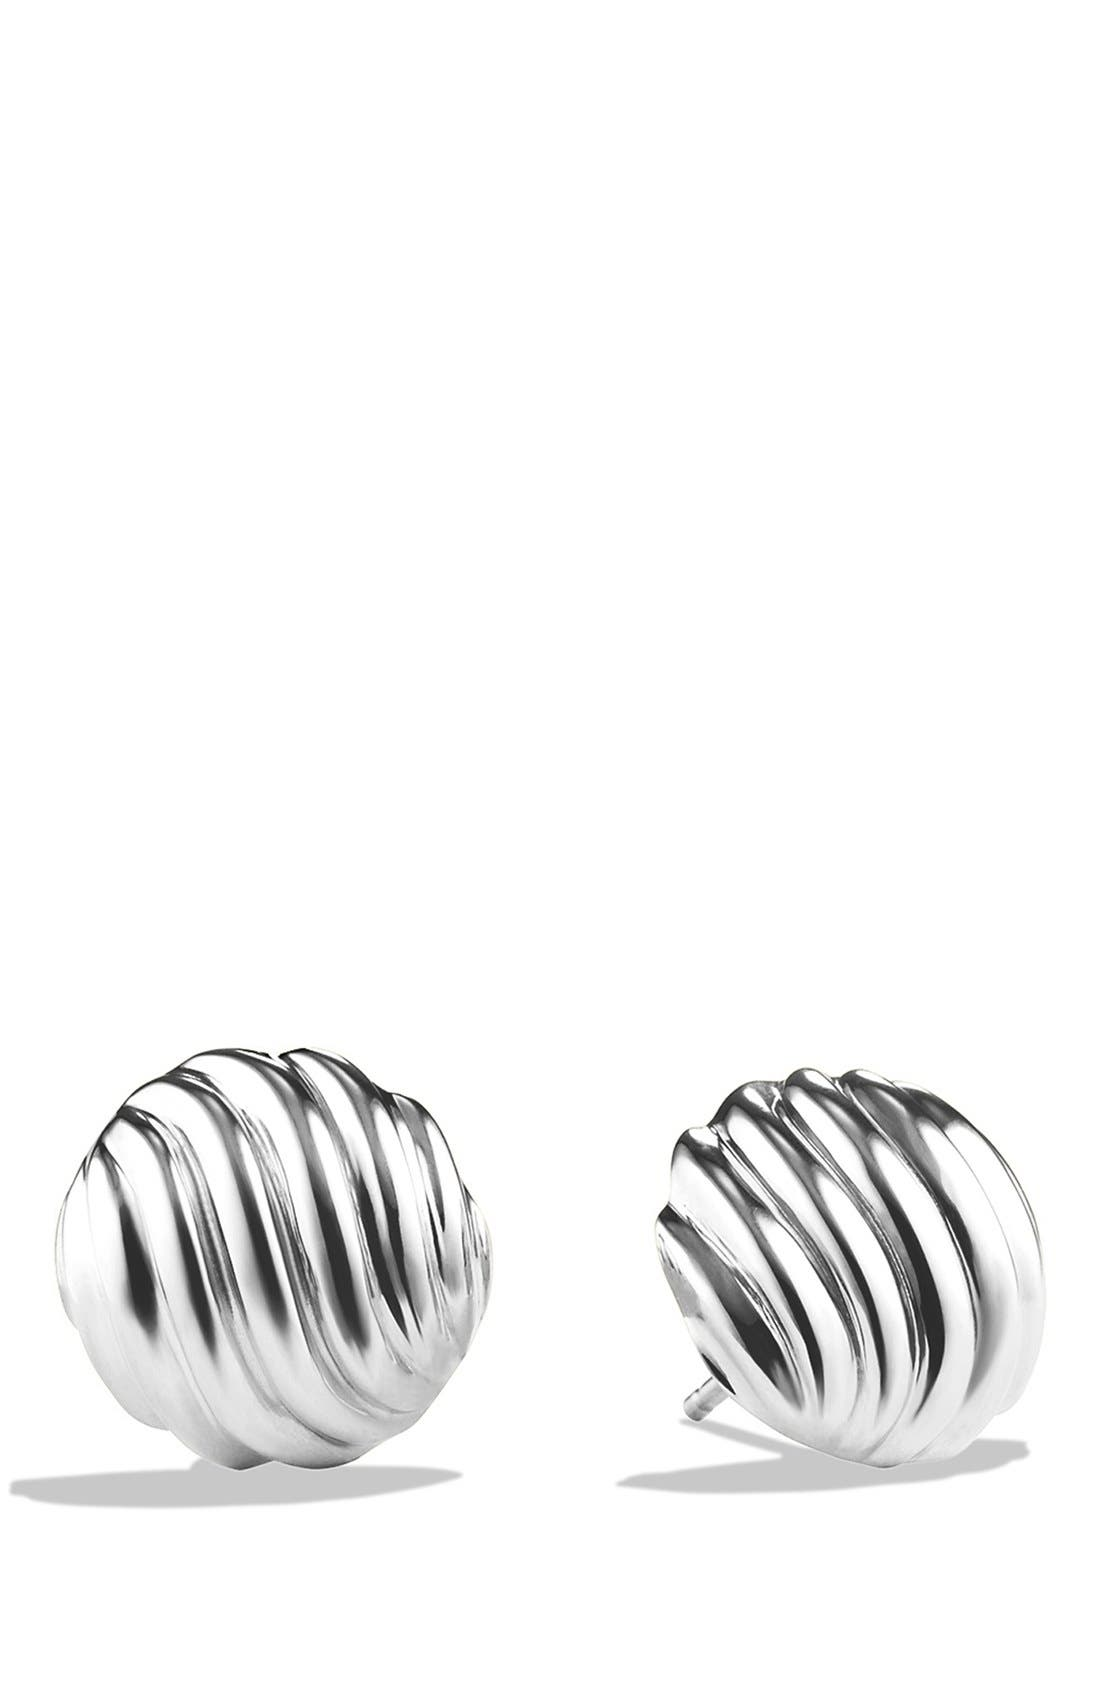 Alternate Image 1 Selected - David Yurman 'Sculpted Cable' Earrings